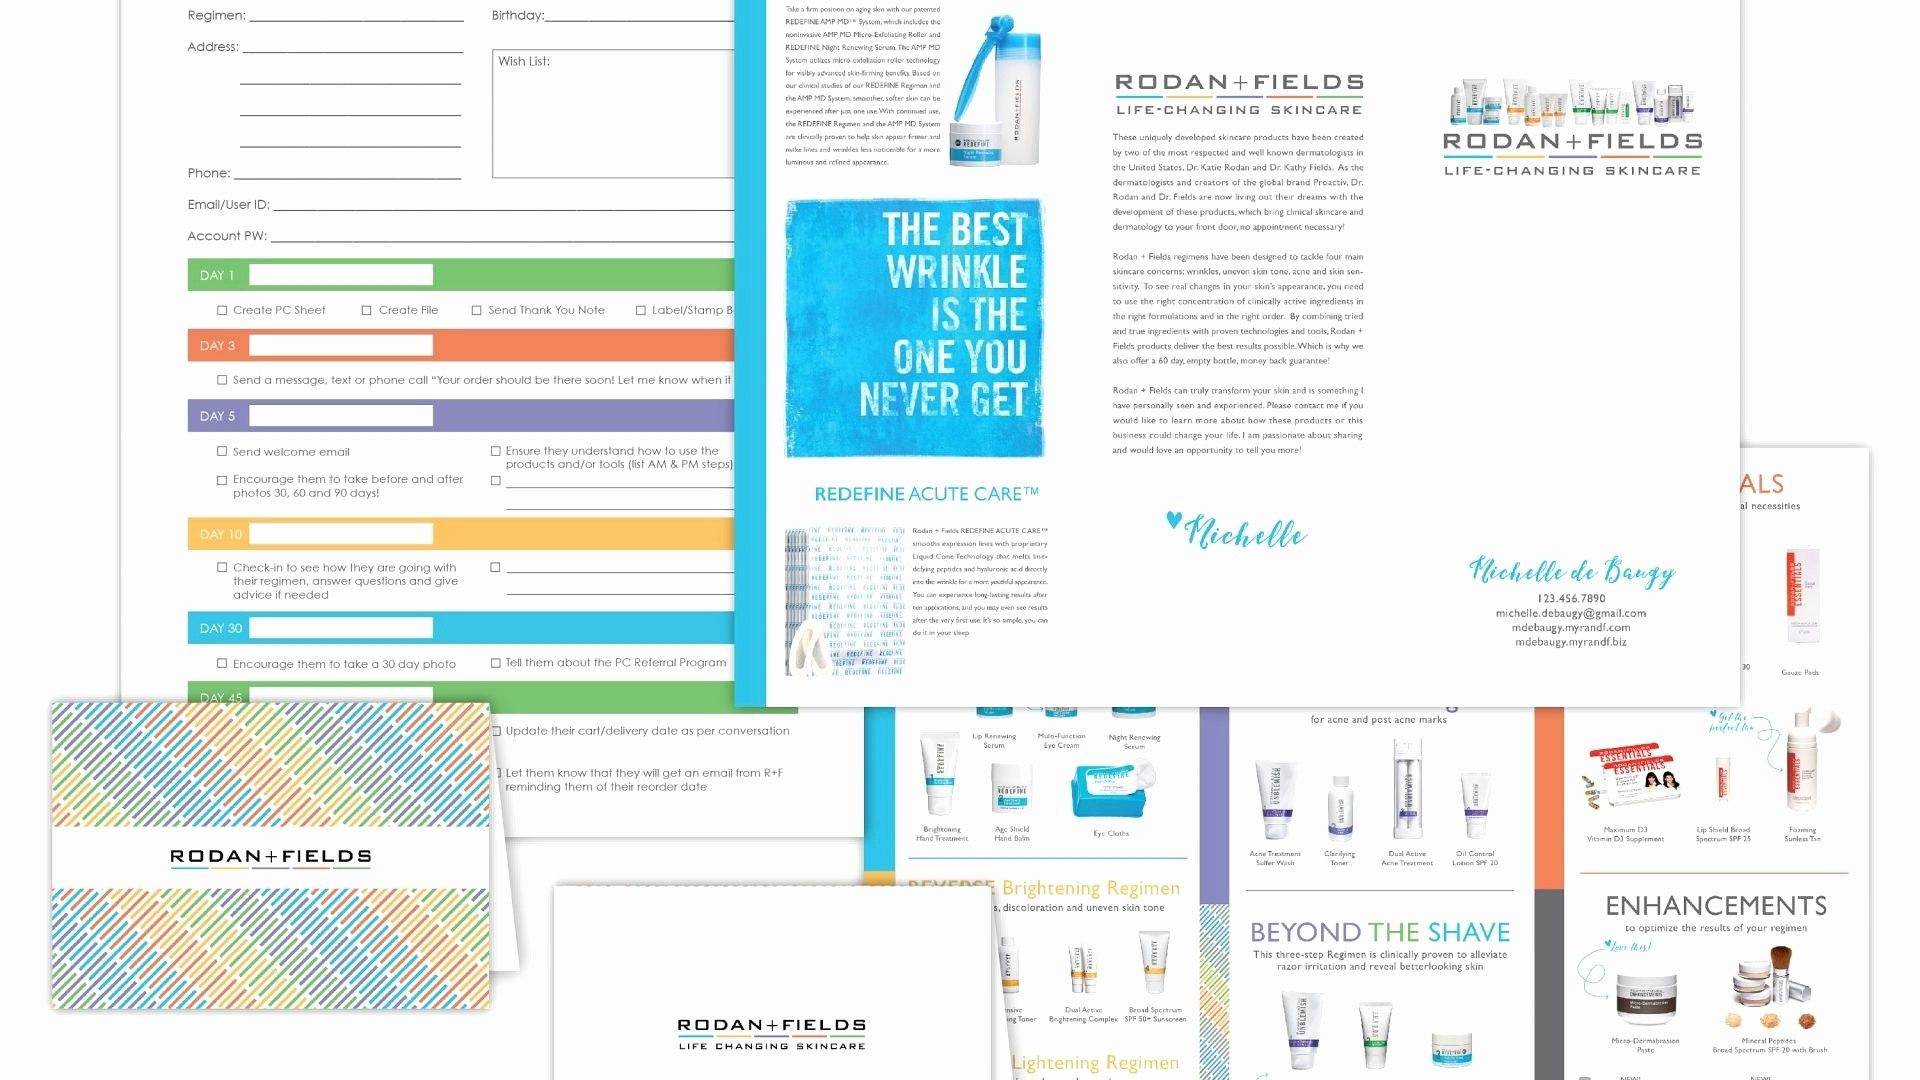 Luxury Rodan And Fields Business Card Template  Hydraexecutives Throughout Rodan And Fields Business Card Template